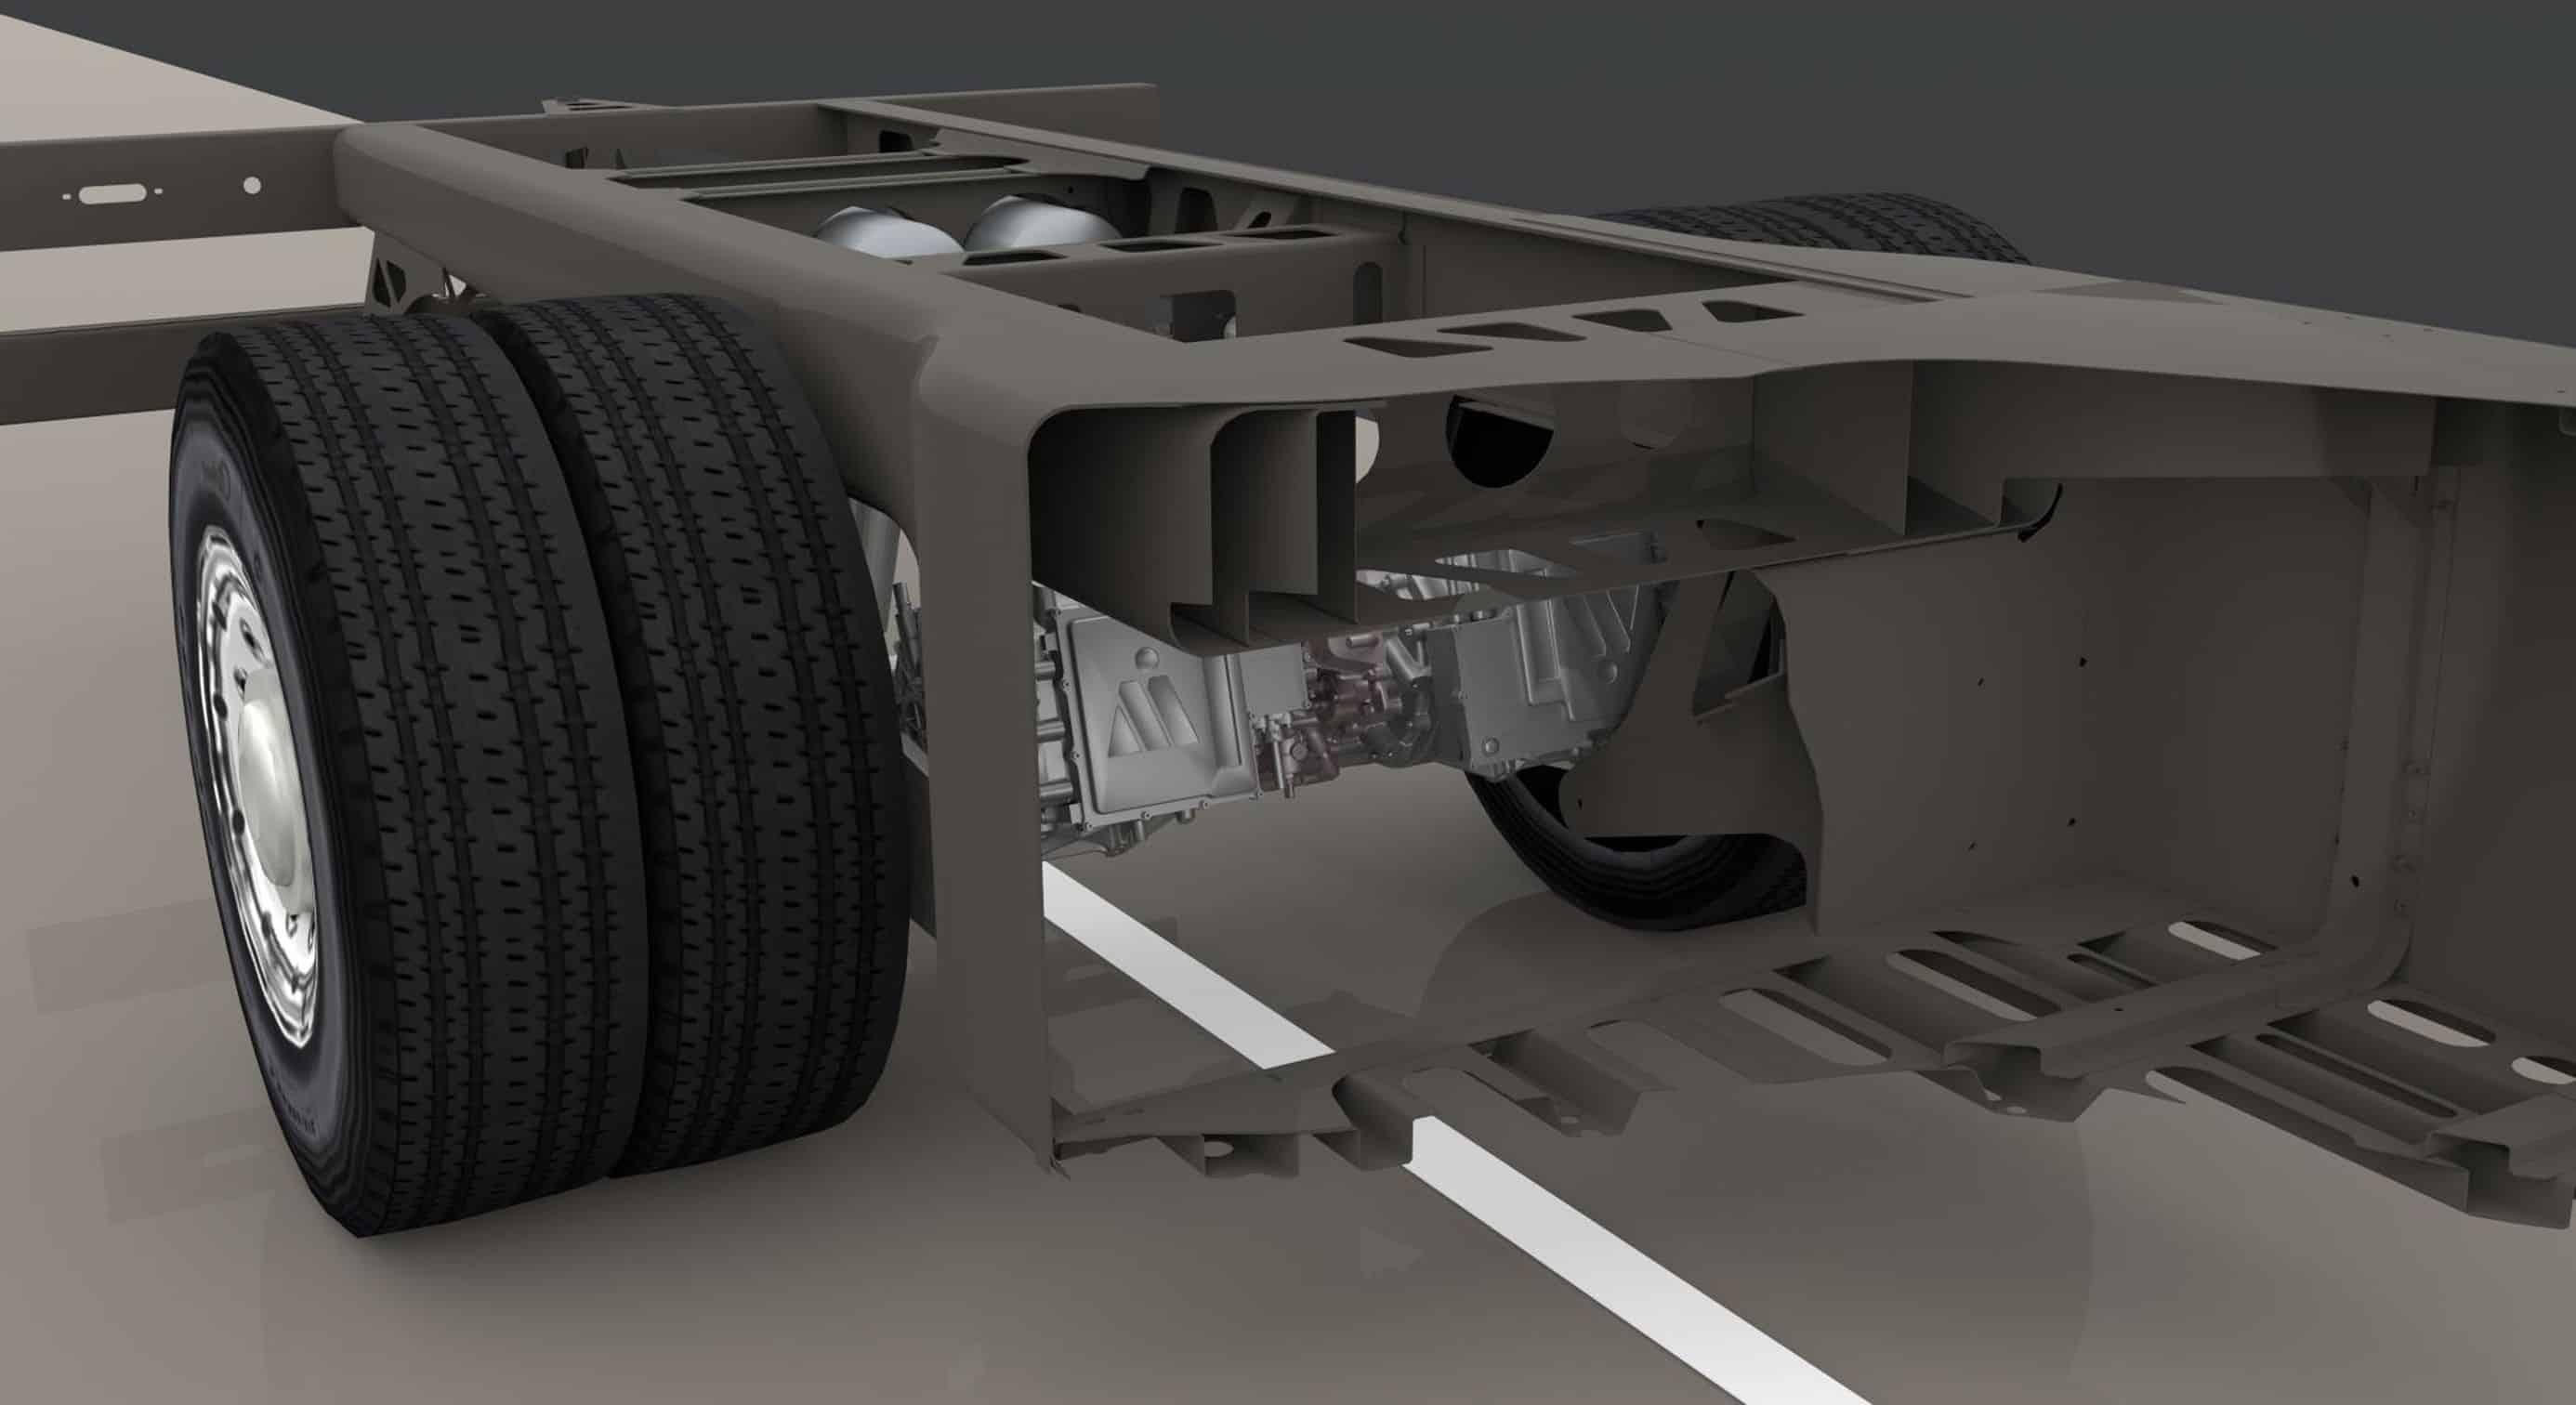 IAA Nutzfahrzeuge 2016: Magna präsentiert Elektrokonzepte | Der ...